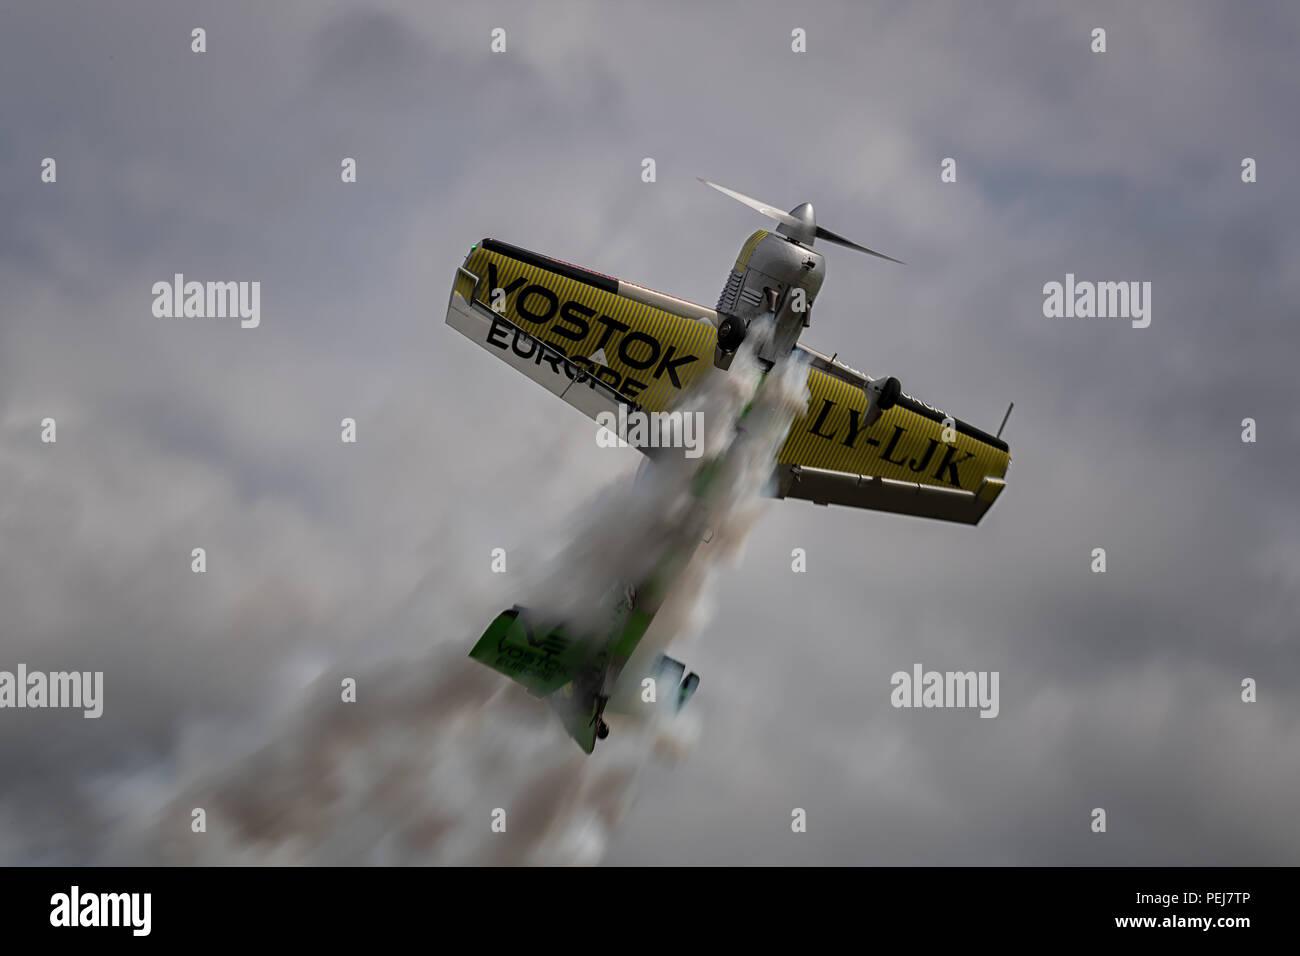 Aerobatic aircraft - Stock Image